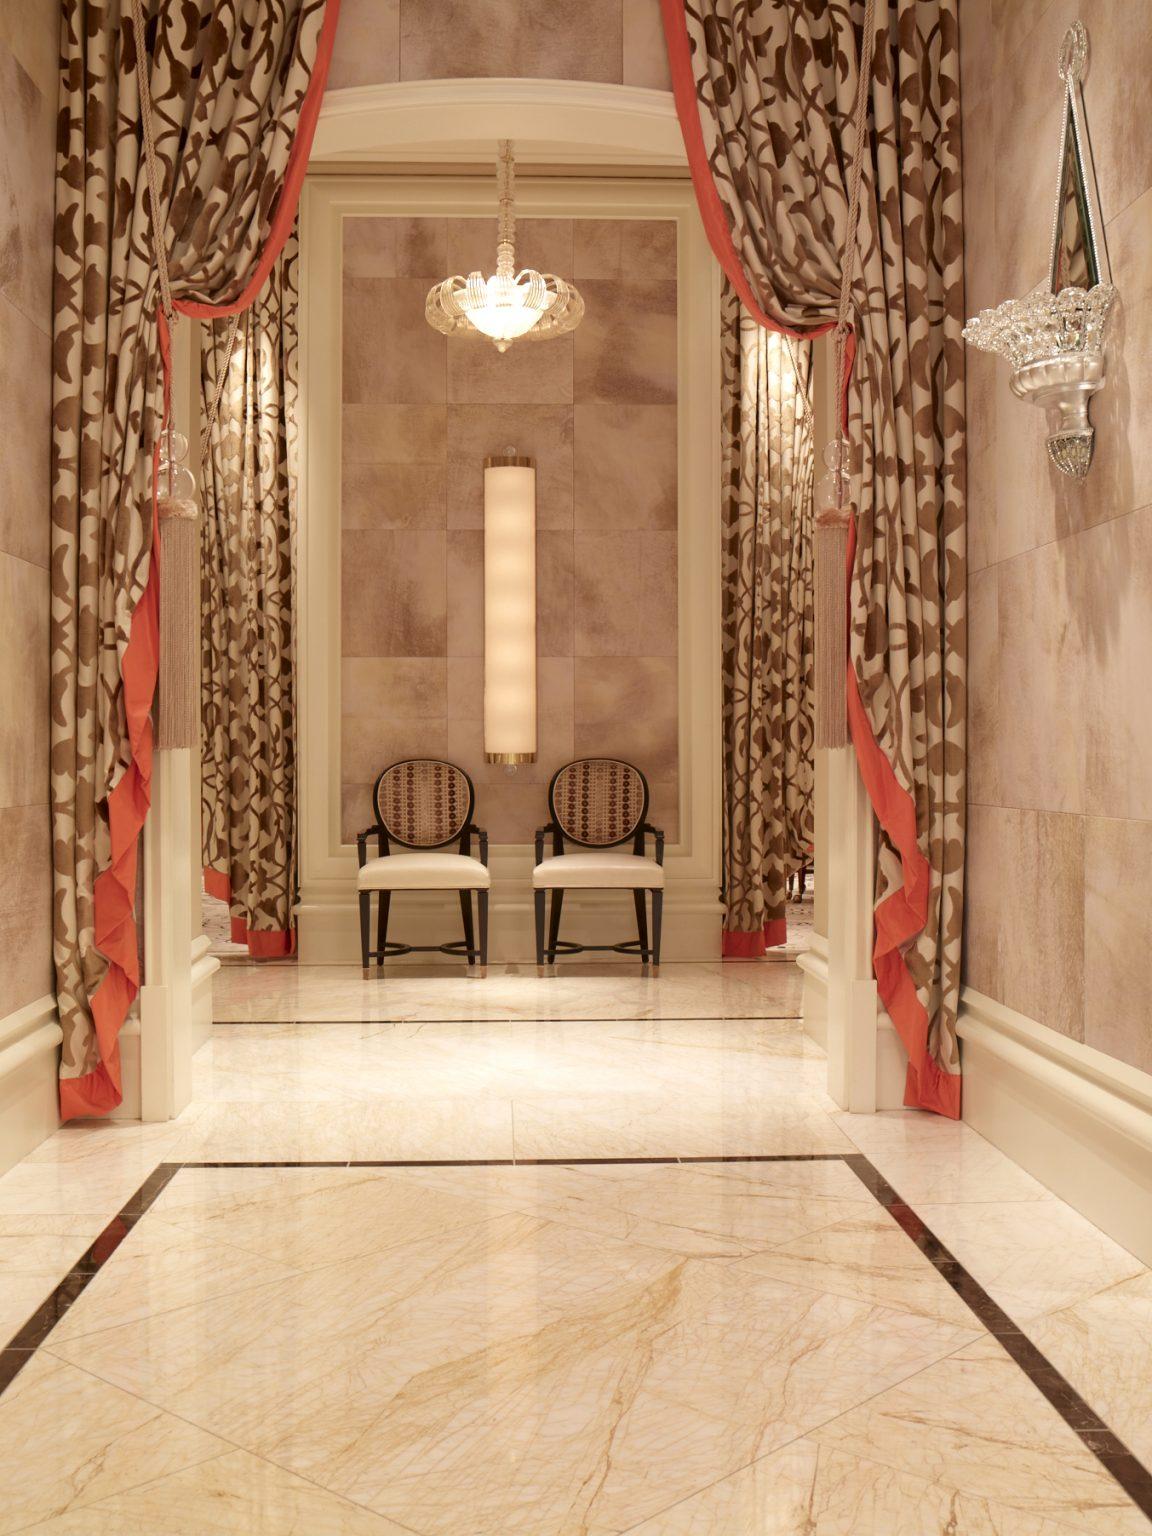 wynn casino baccarat room tlc rtc faux parchment tiles 3